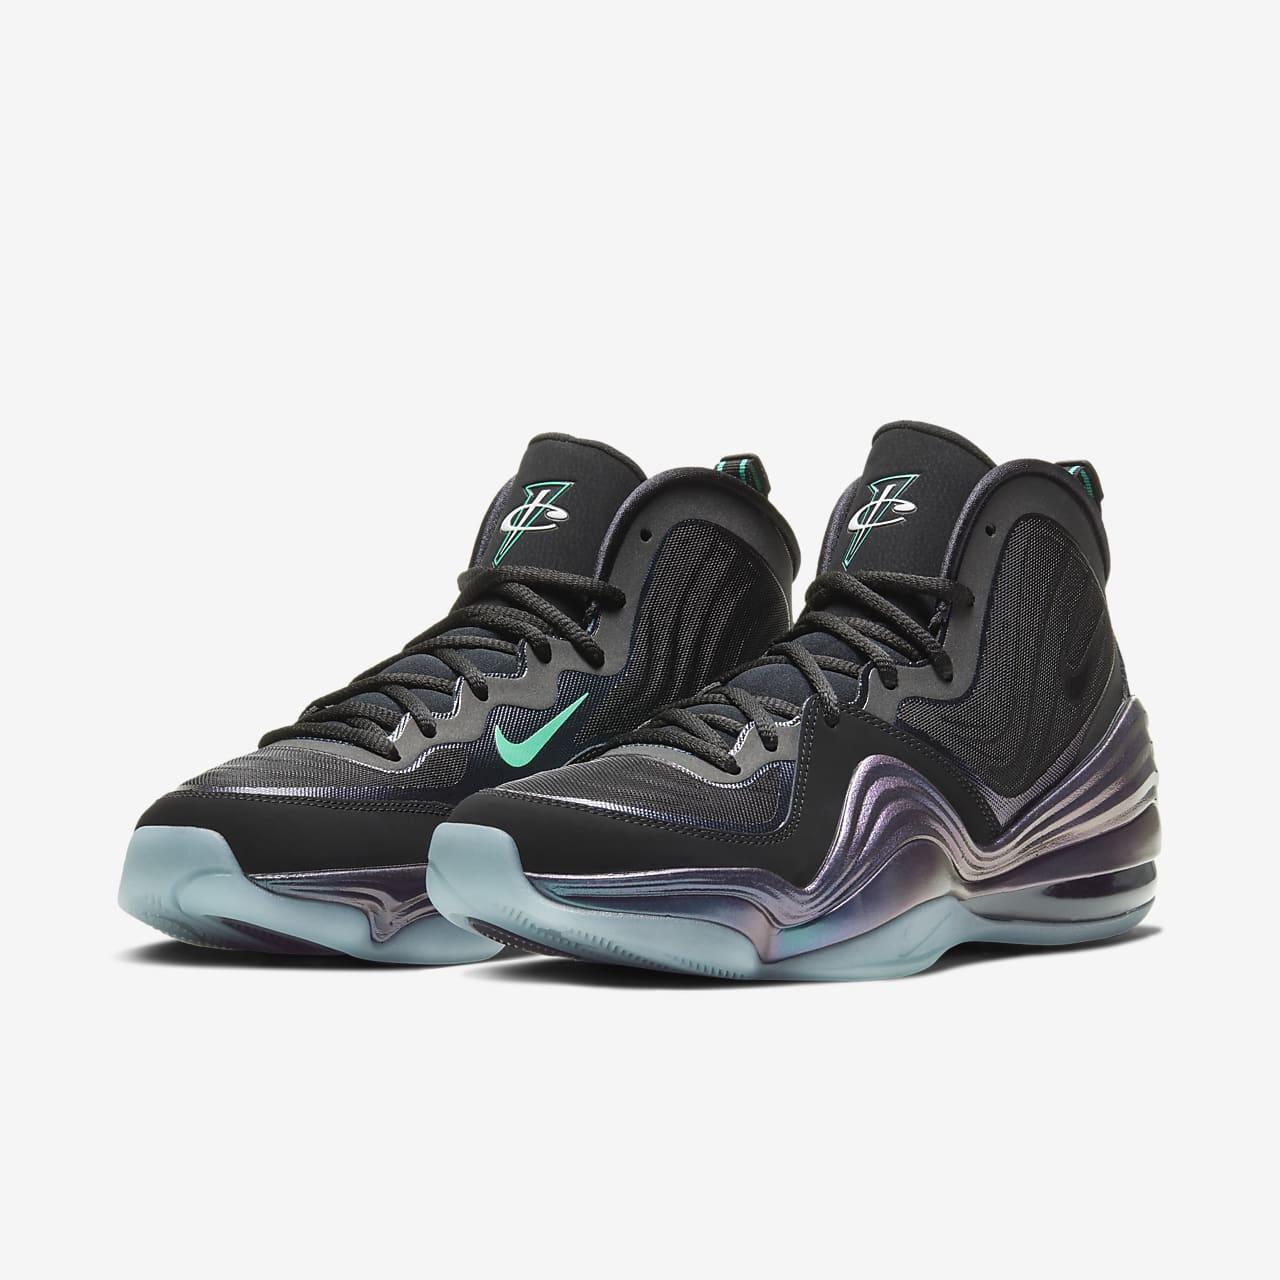 Nike Air Penny V Men's Shoe 537331-002